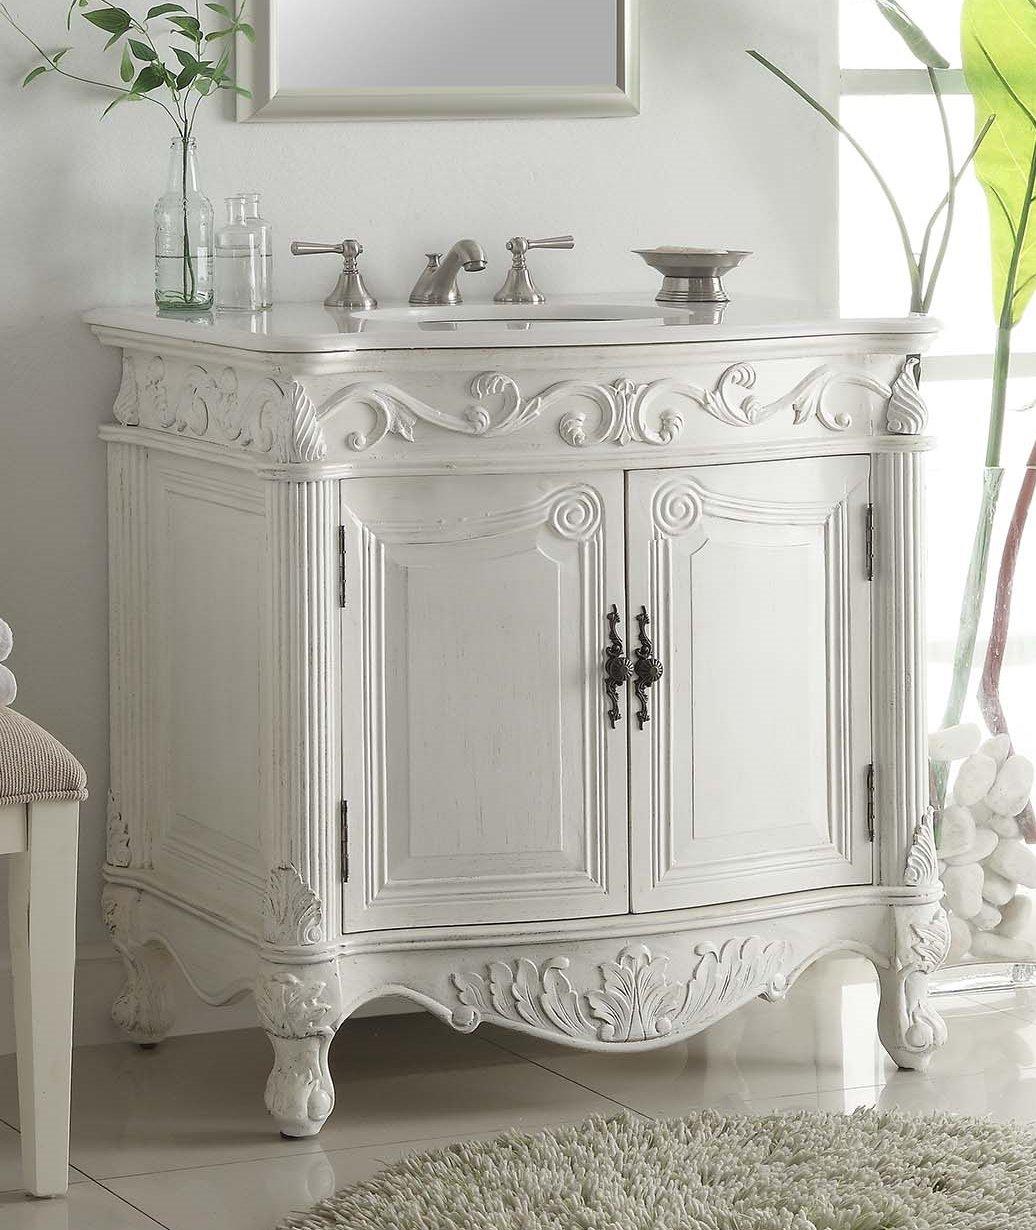 32 traditional style fiesta bathroom sink vanity cabinet cf 2873w aw barstools with backs amazoncom